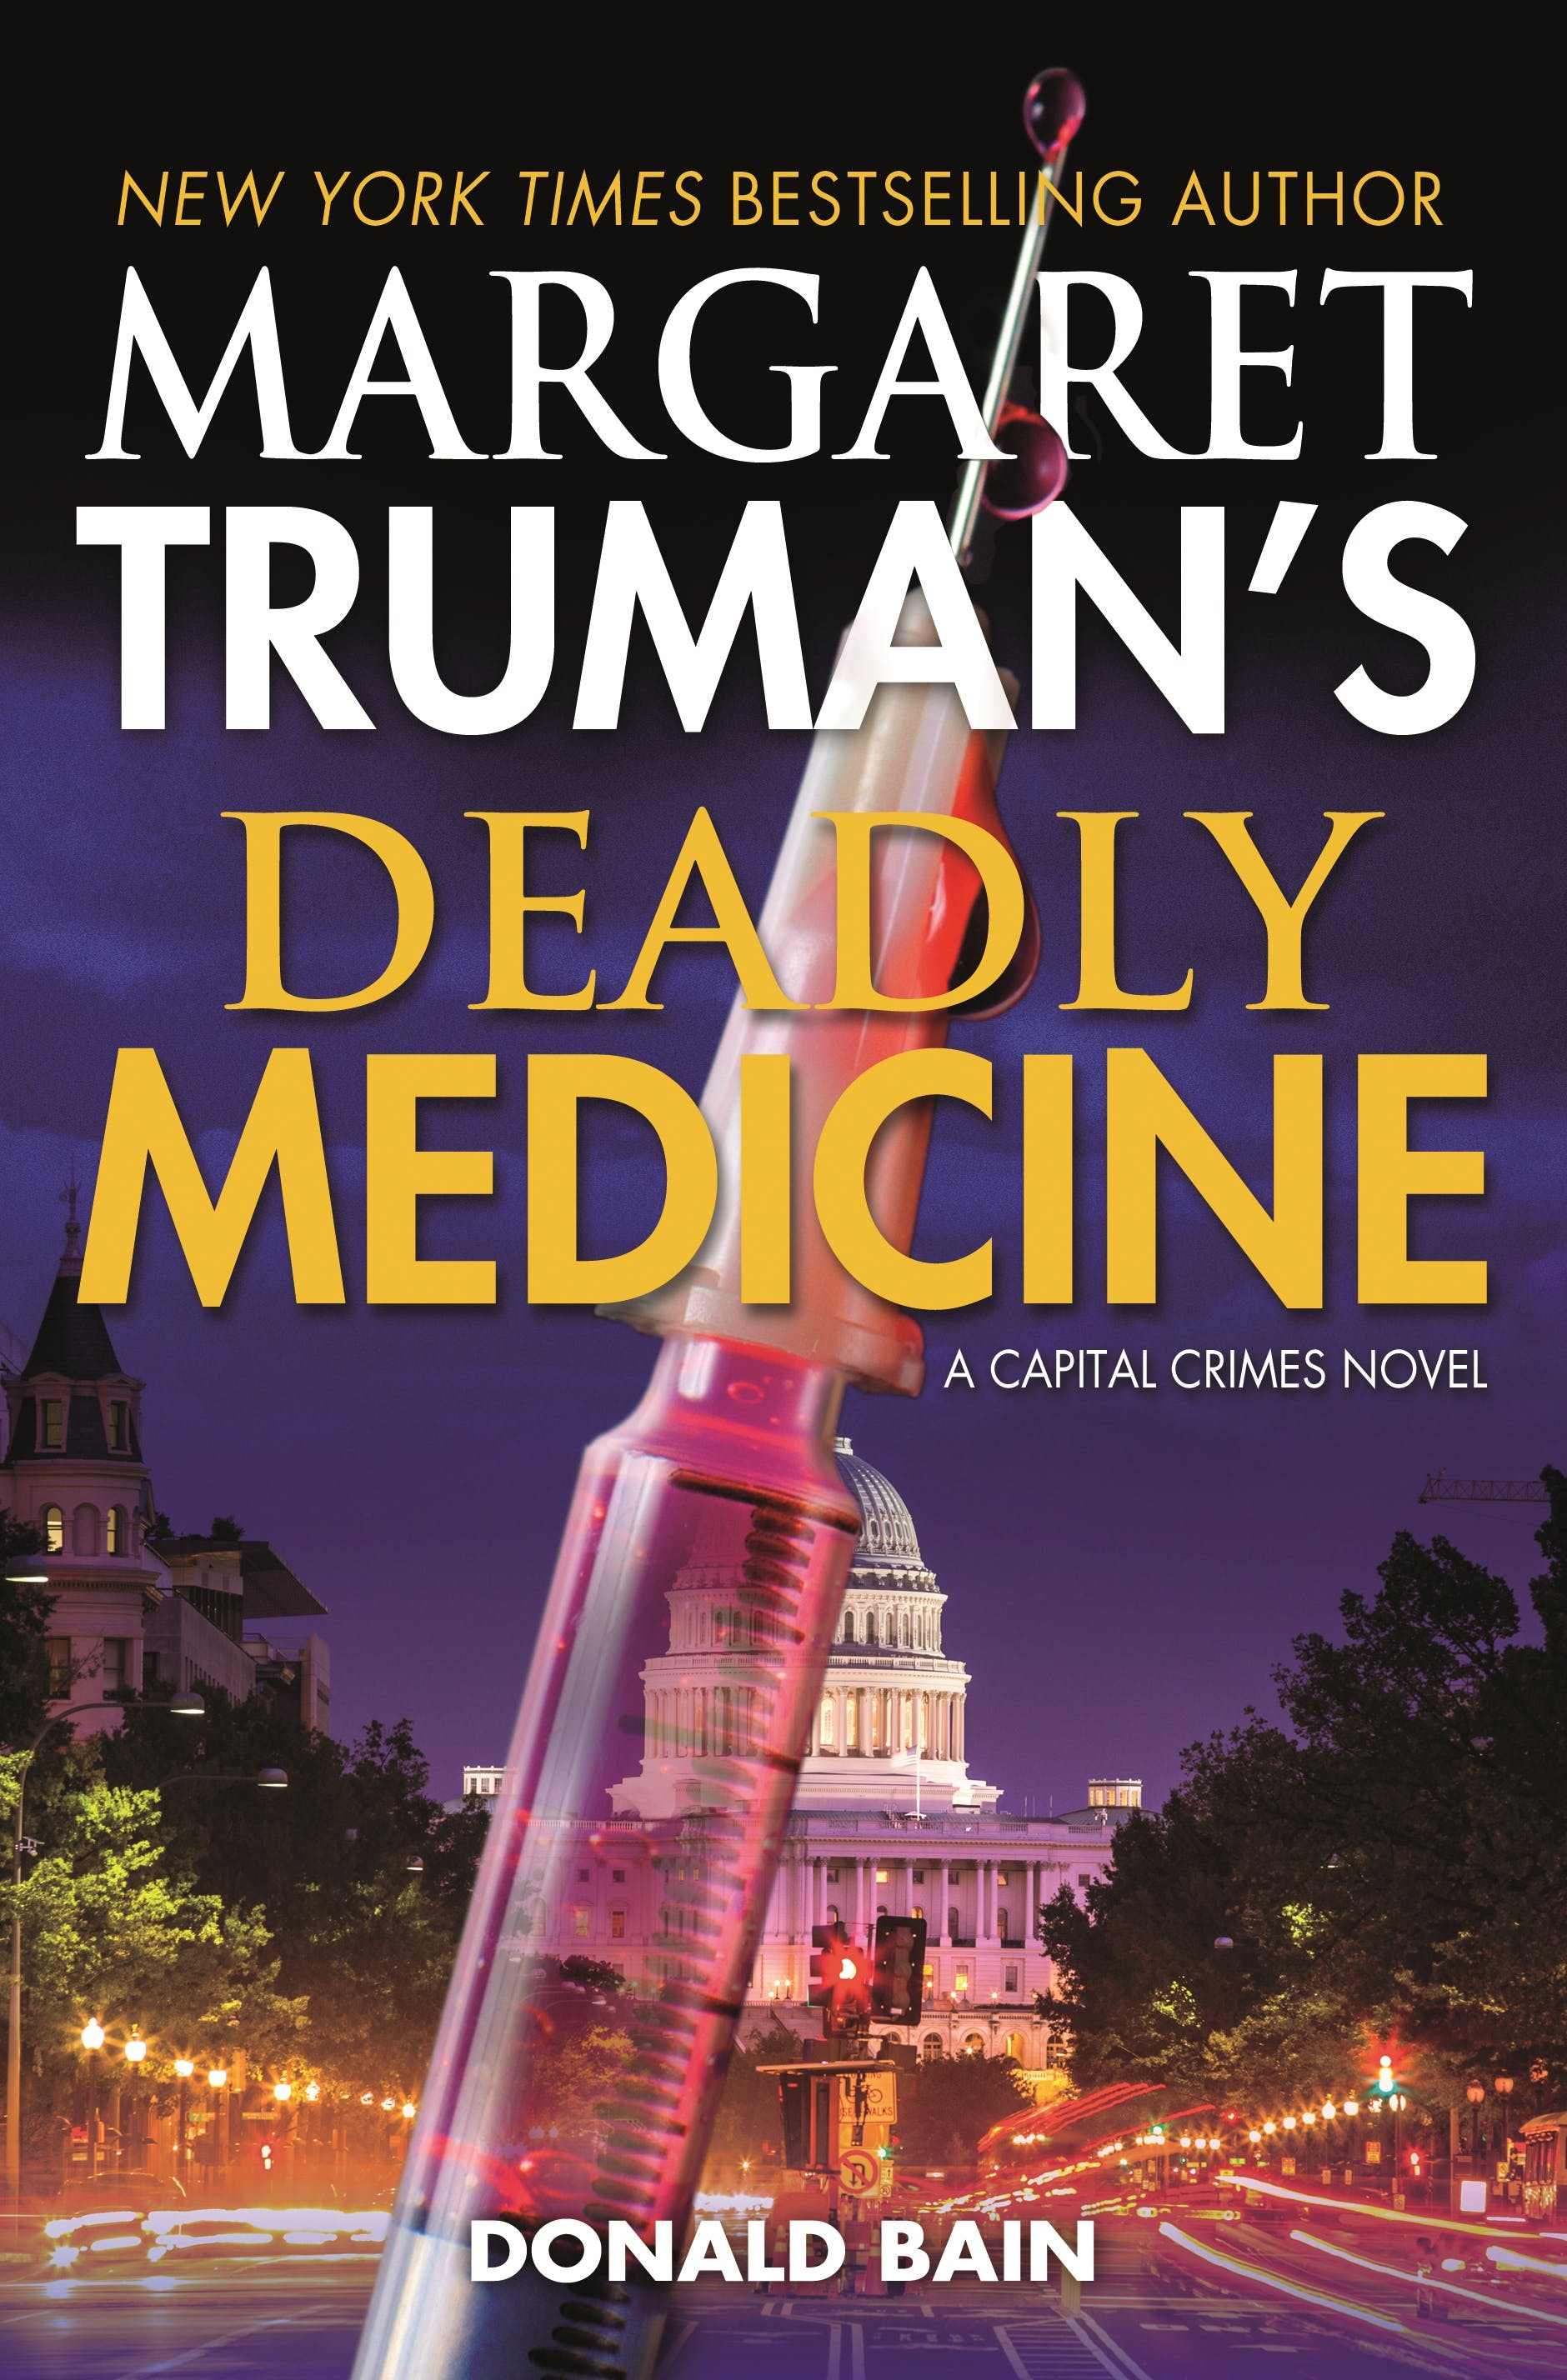 Image of Margaret Truman's Deadly Medicine